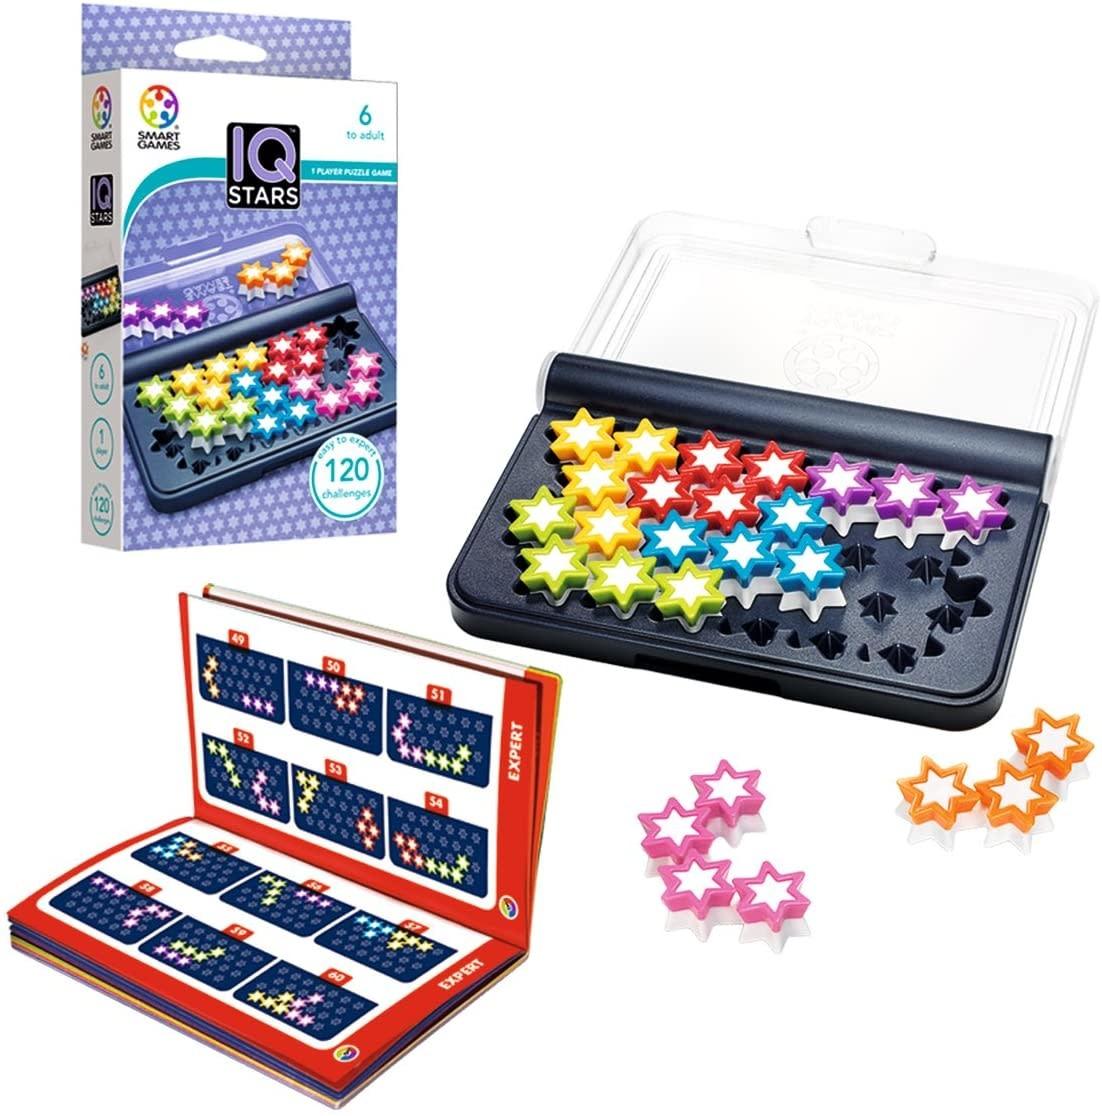 Game/IQ Stars-1